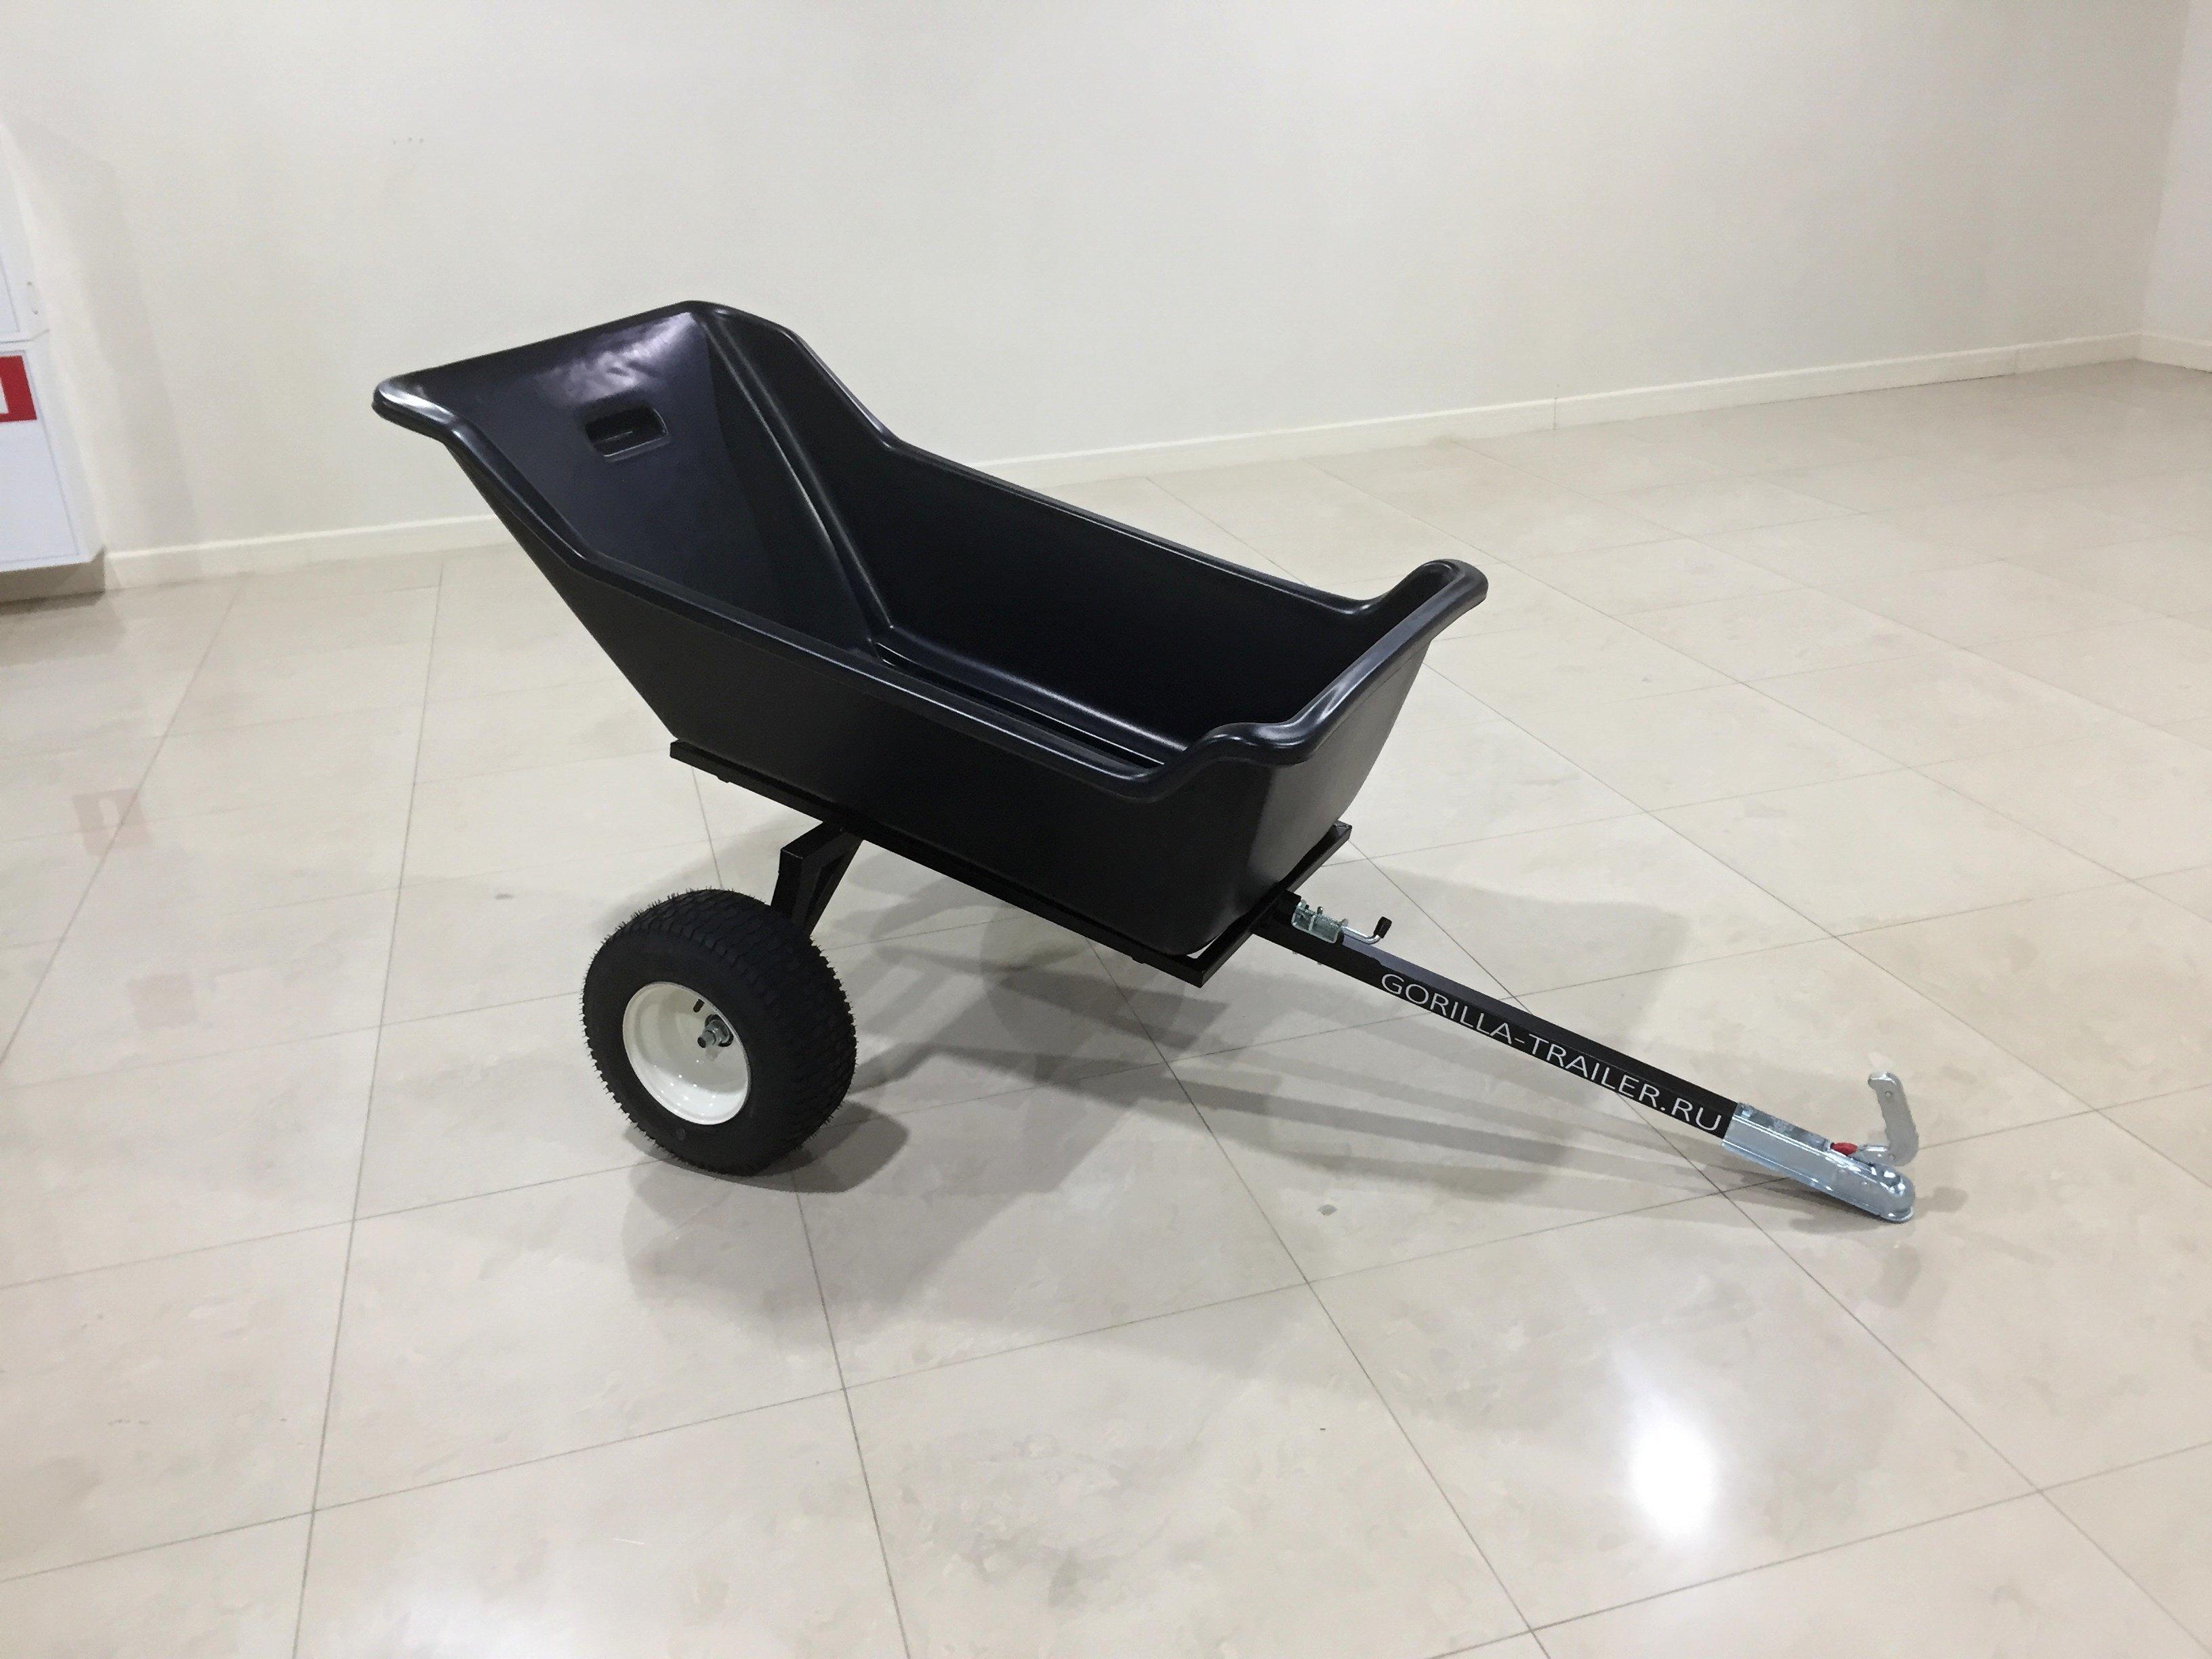 Прицеп для квадроцикла GORILLA TRAILER 1500